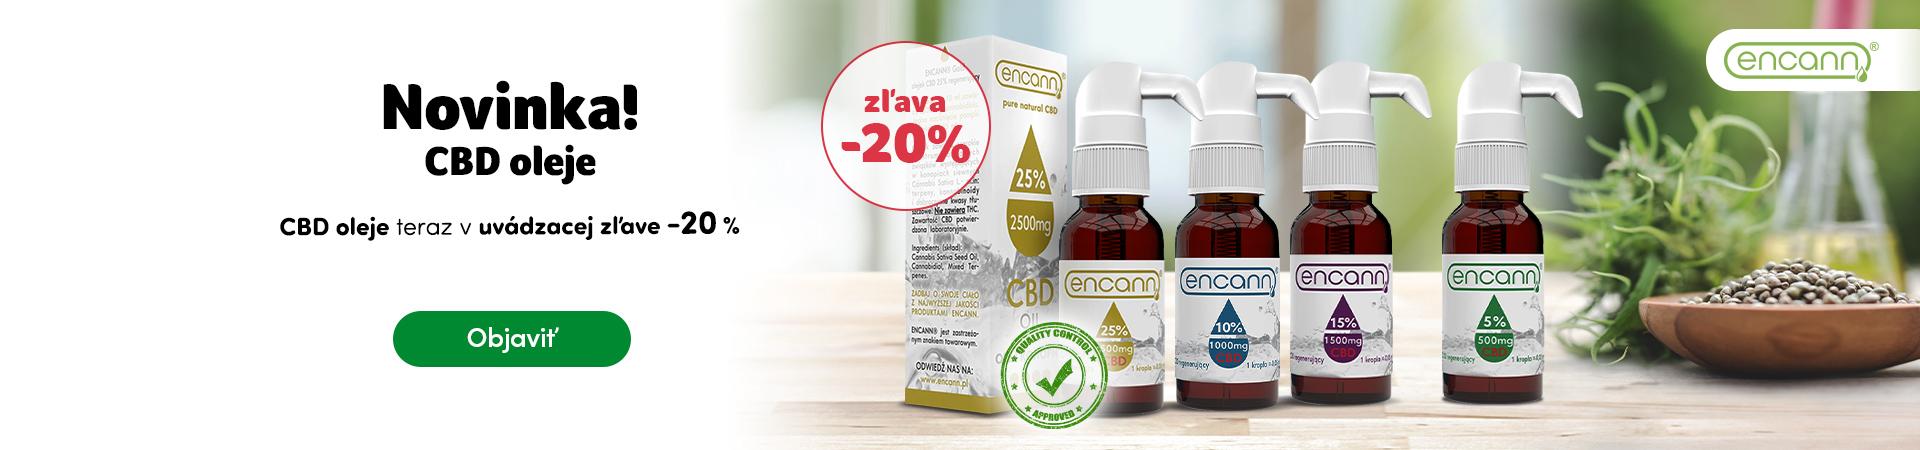 CBD oleje Encann